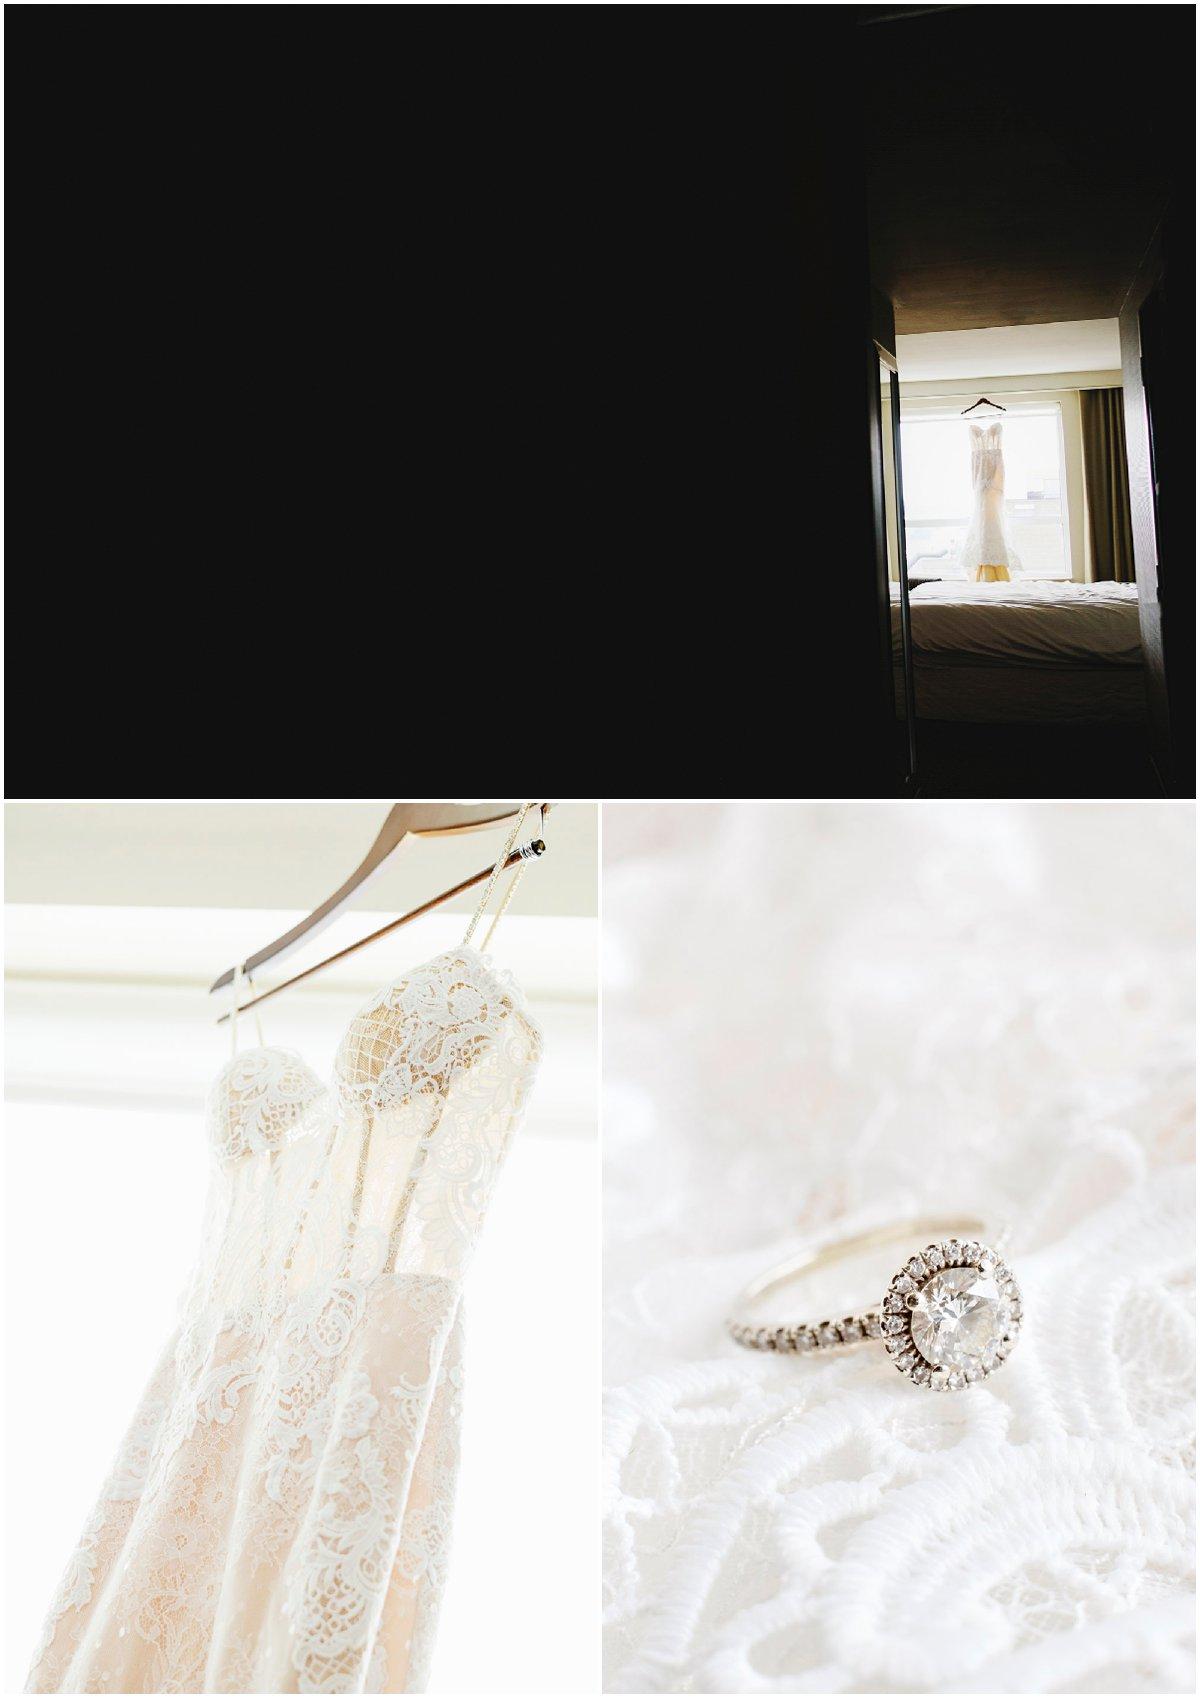 Real Weddings Archives - Montreal Wedding Blog